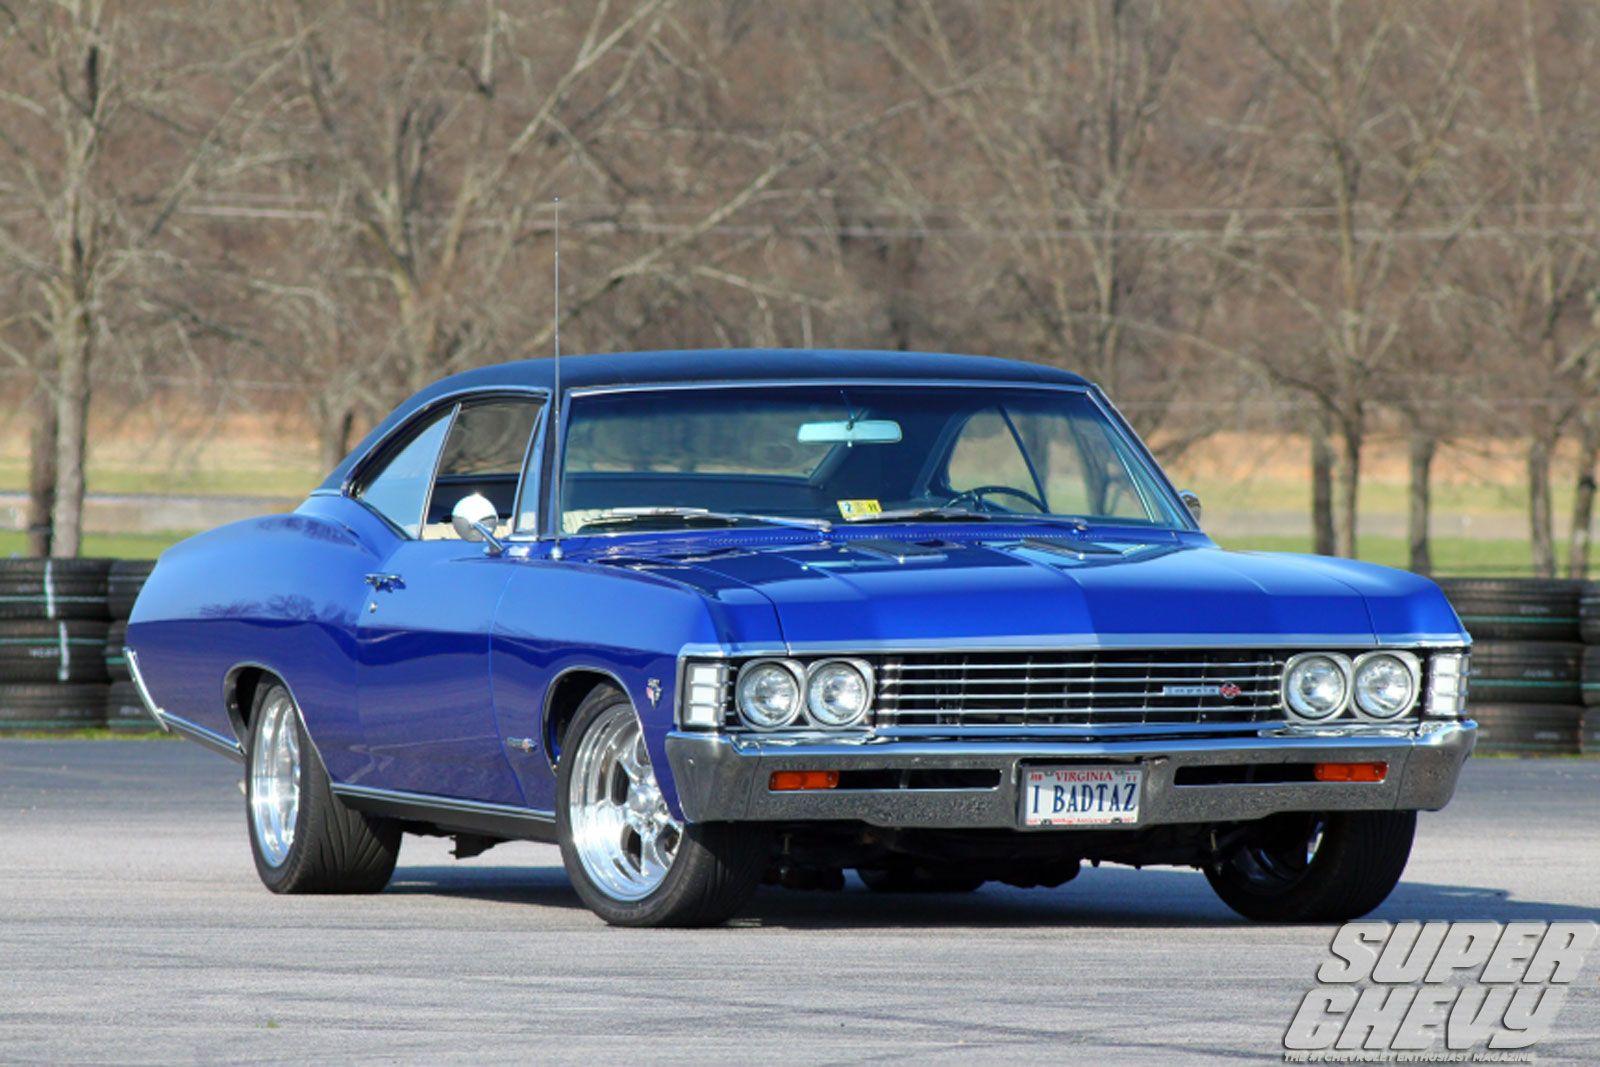 All Chevy chevy 1967 : 1967 chevrolet impala | Sucp 1108 11 1967 Chevrolet Impala Photo ...